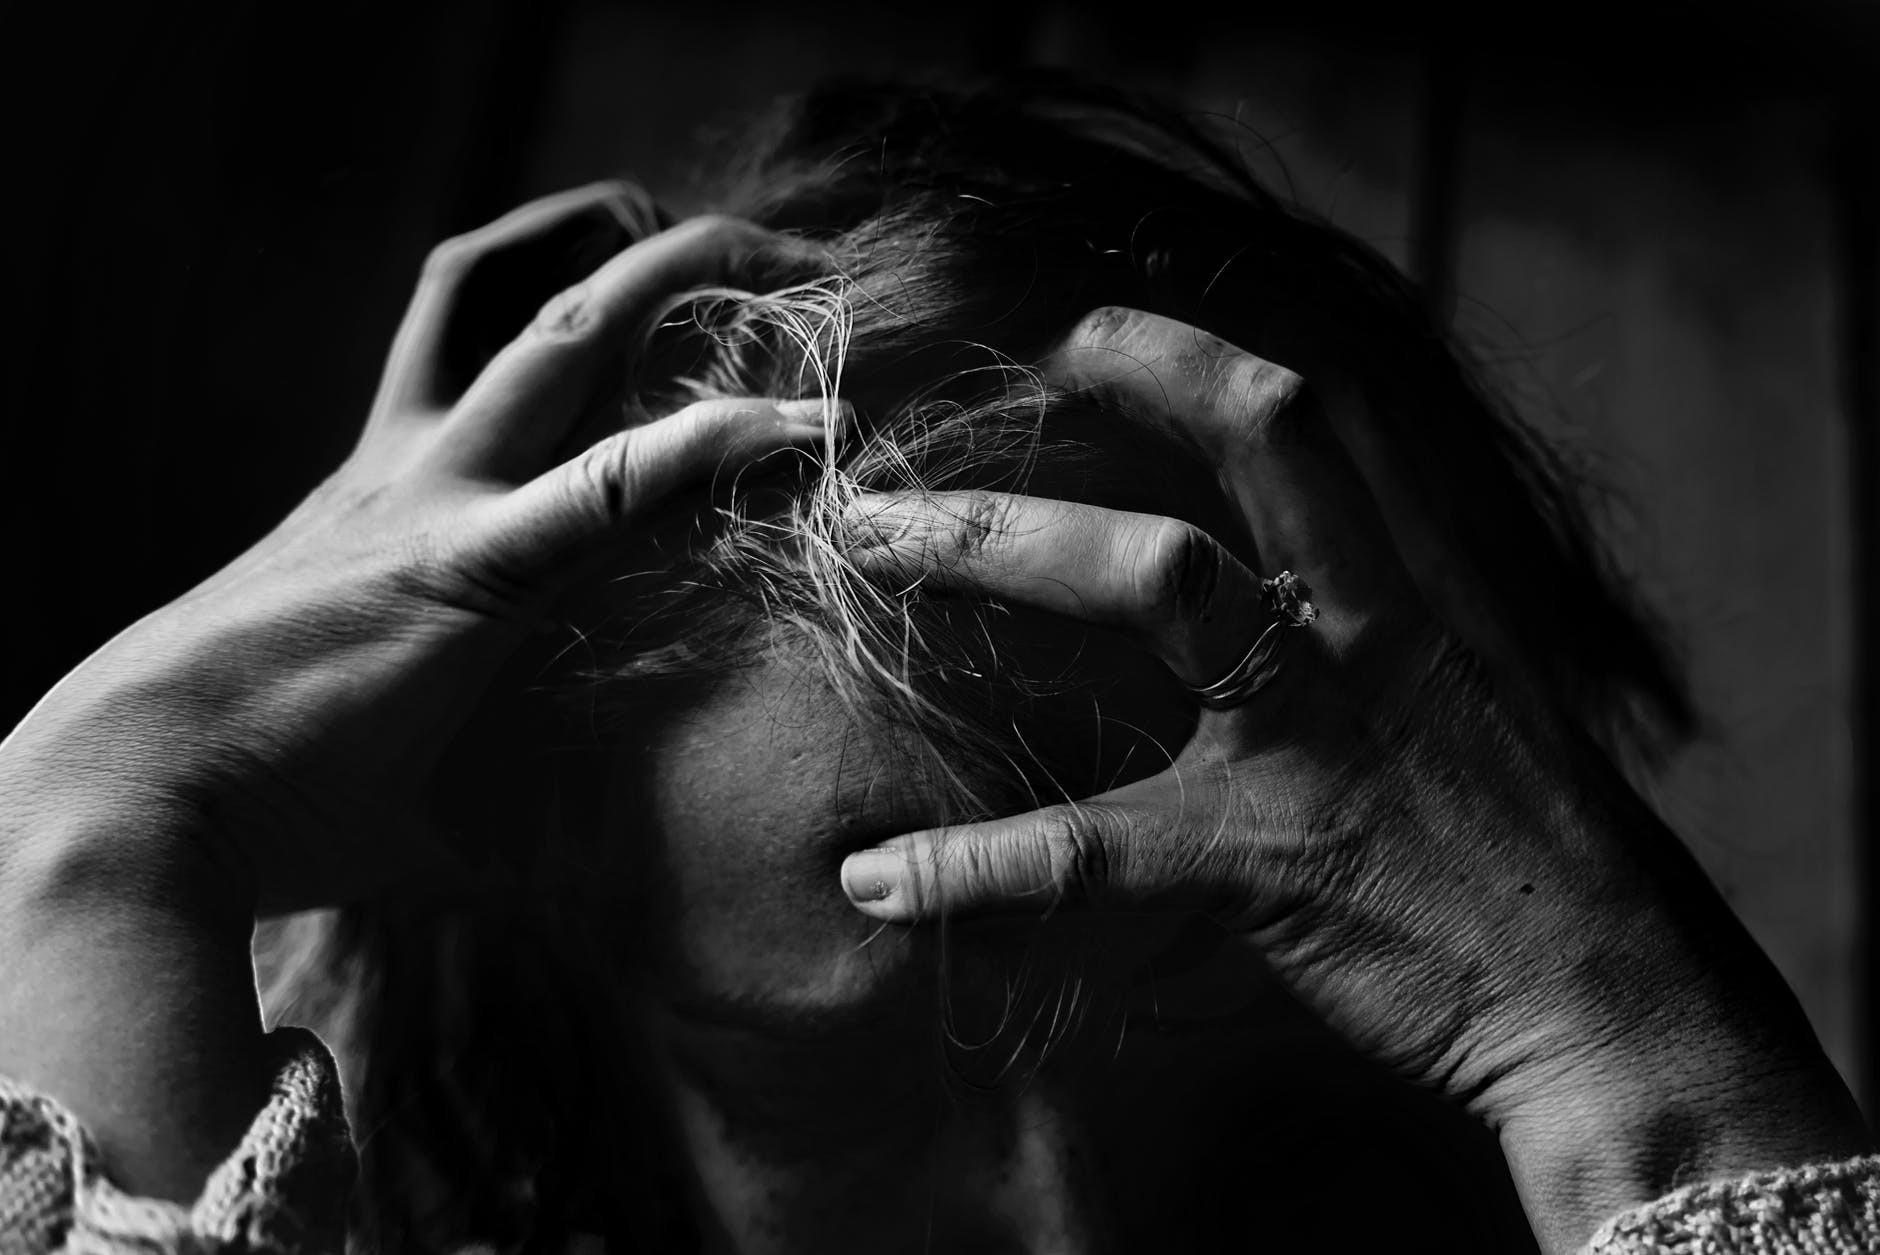 Suicídio pode ser contagioso? (Foto: Pexels/Creative Commons)